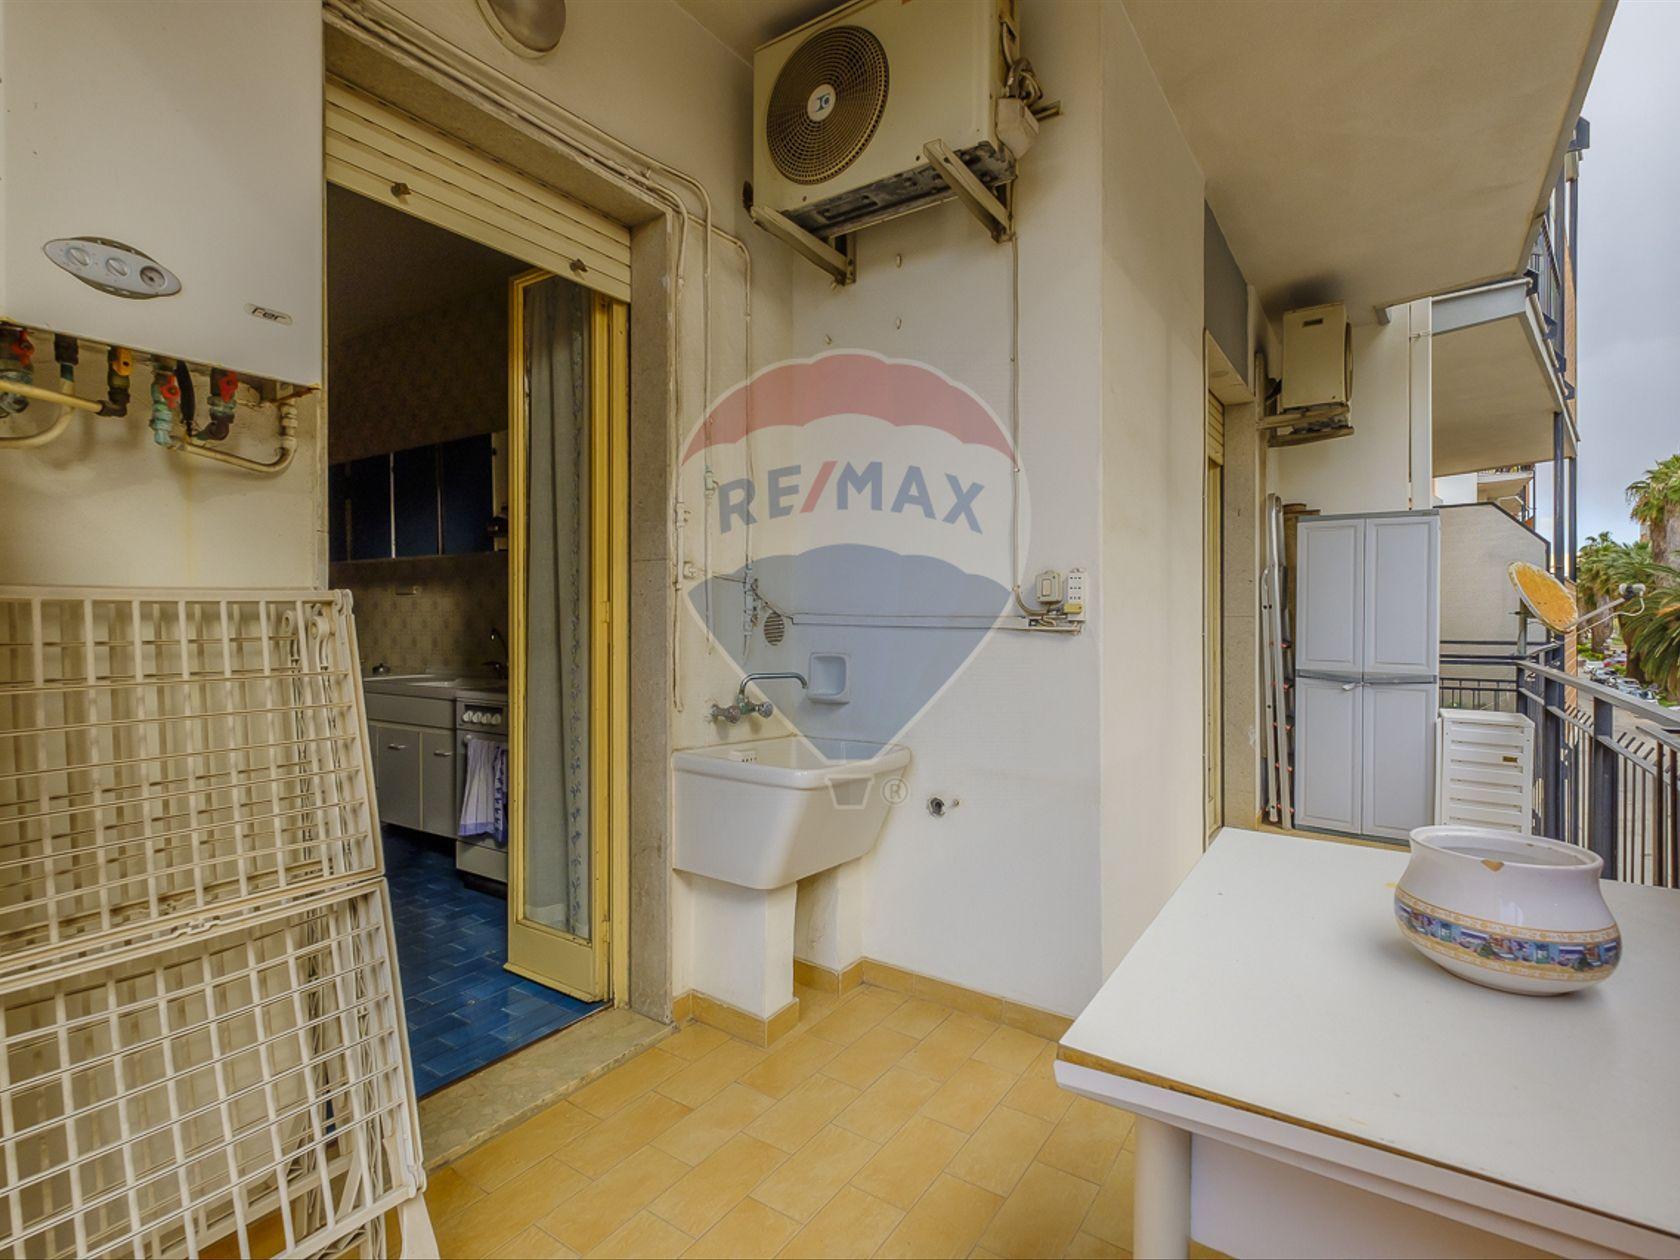 Appartamento Siracusa- Scala Greca S. Panagia Teracati Zecchino, Siracusa, SR Vendita - Foto 20